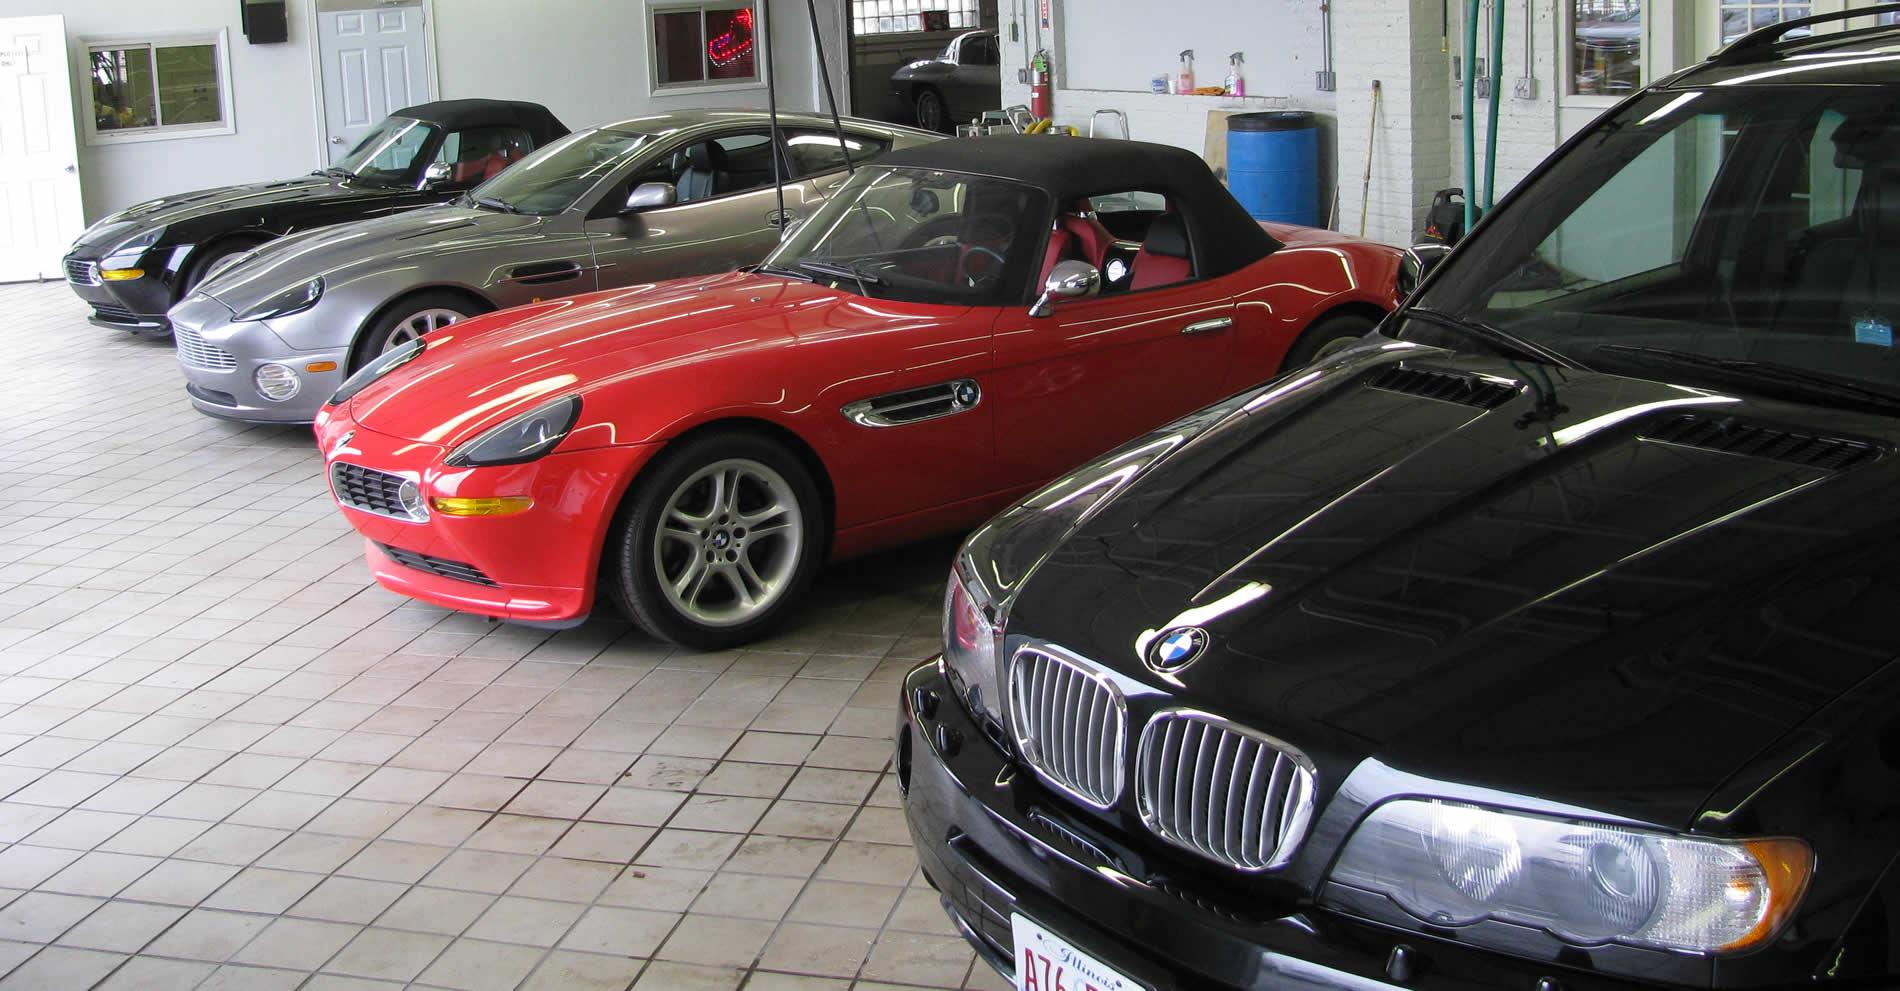 Albany Auto Repair & Auto Body